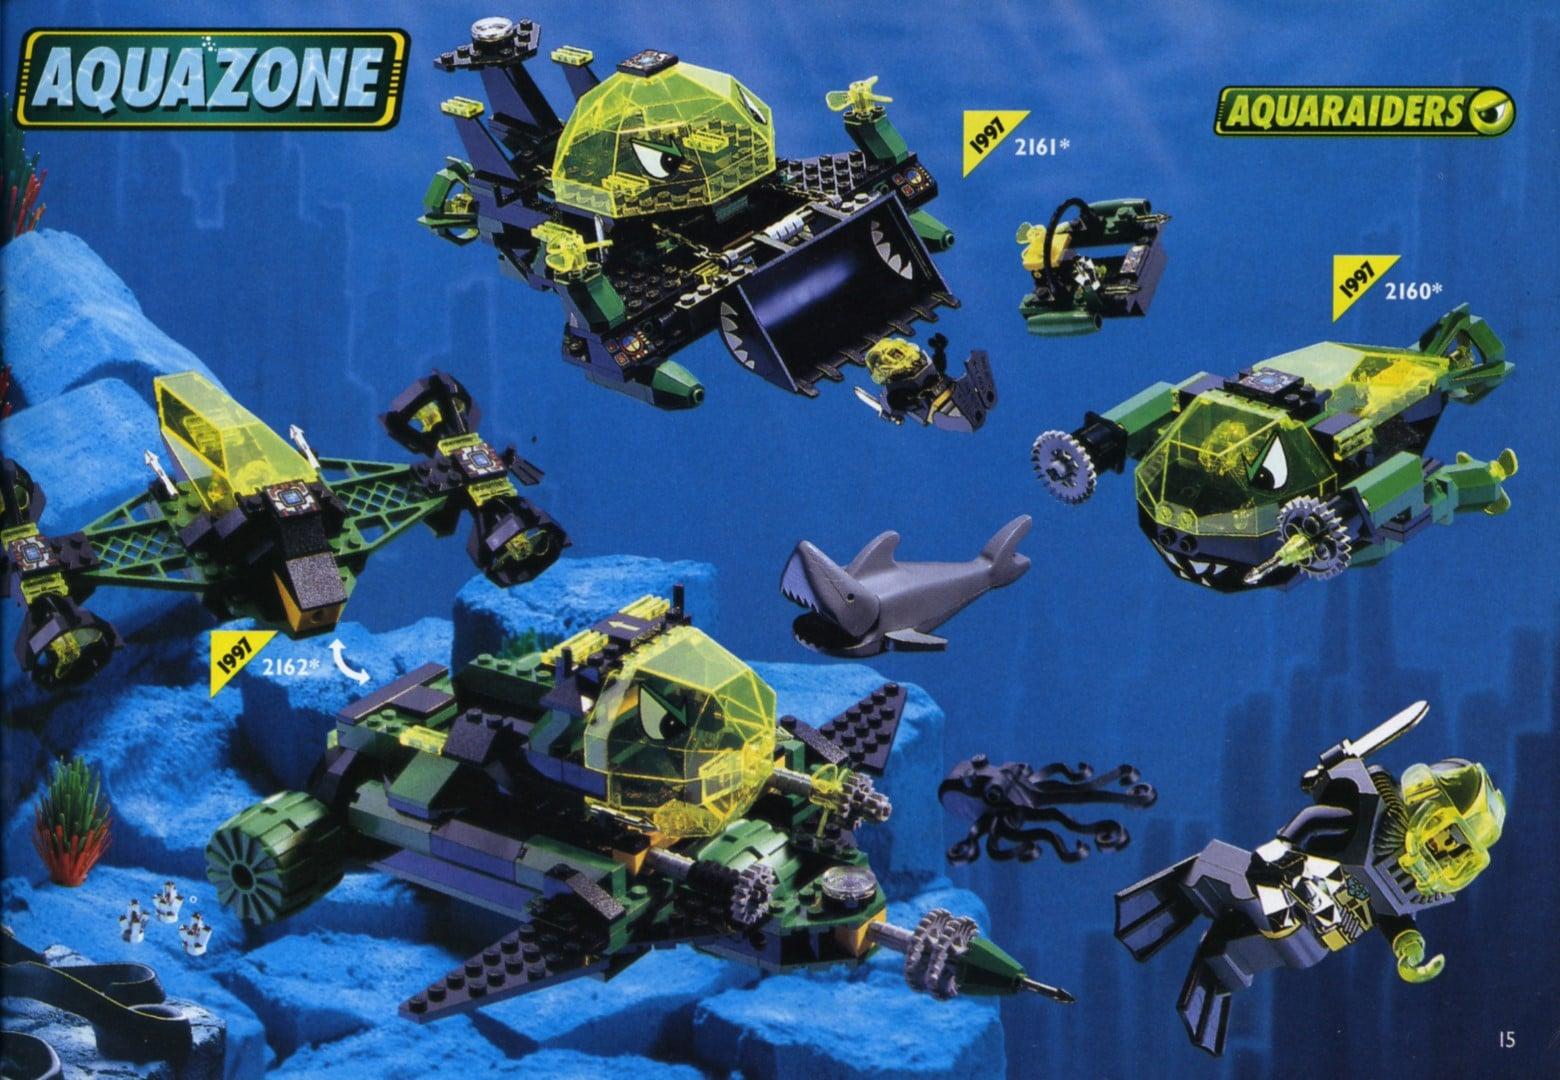 Aquaraiders im US Katalog von 1997 (Quelle: Brickset)